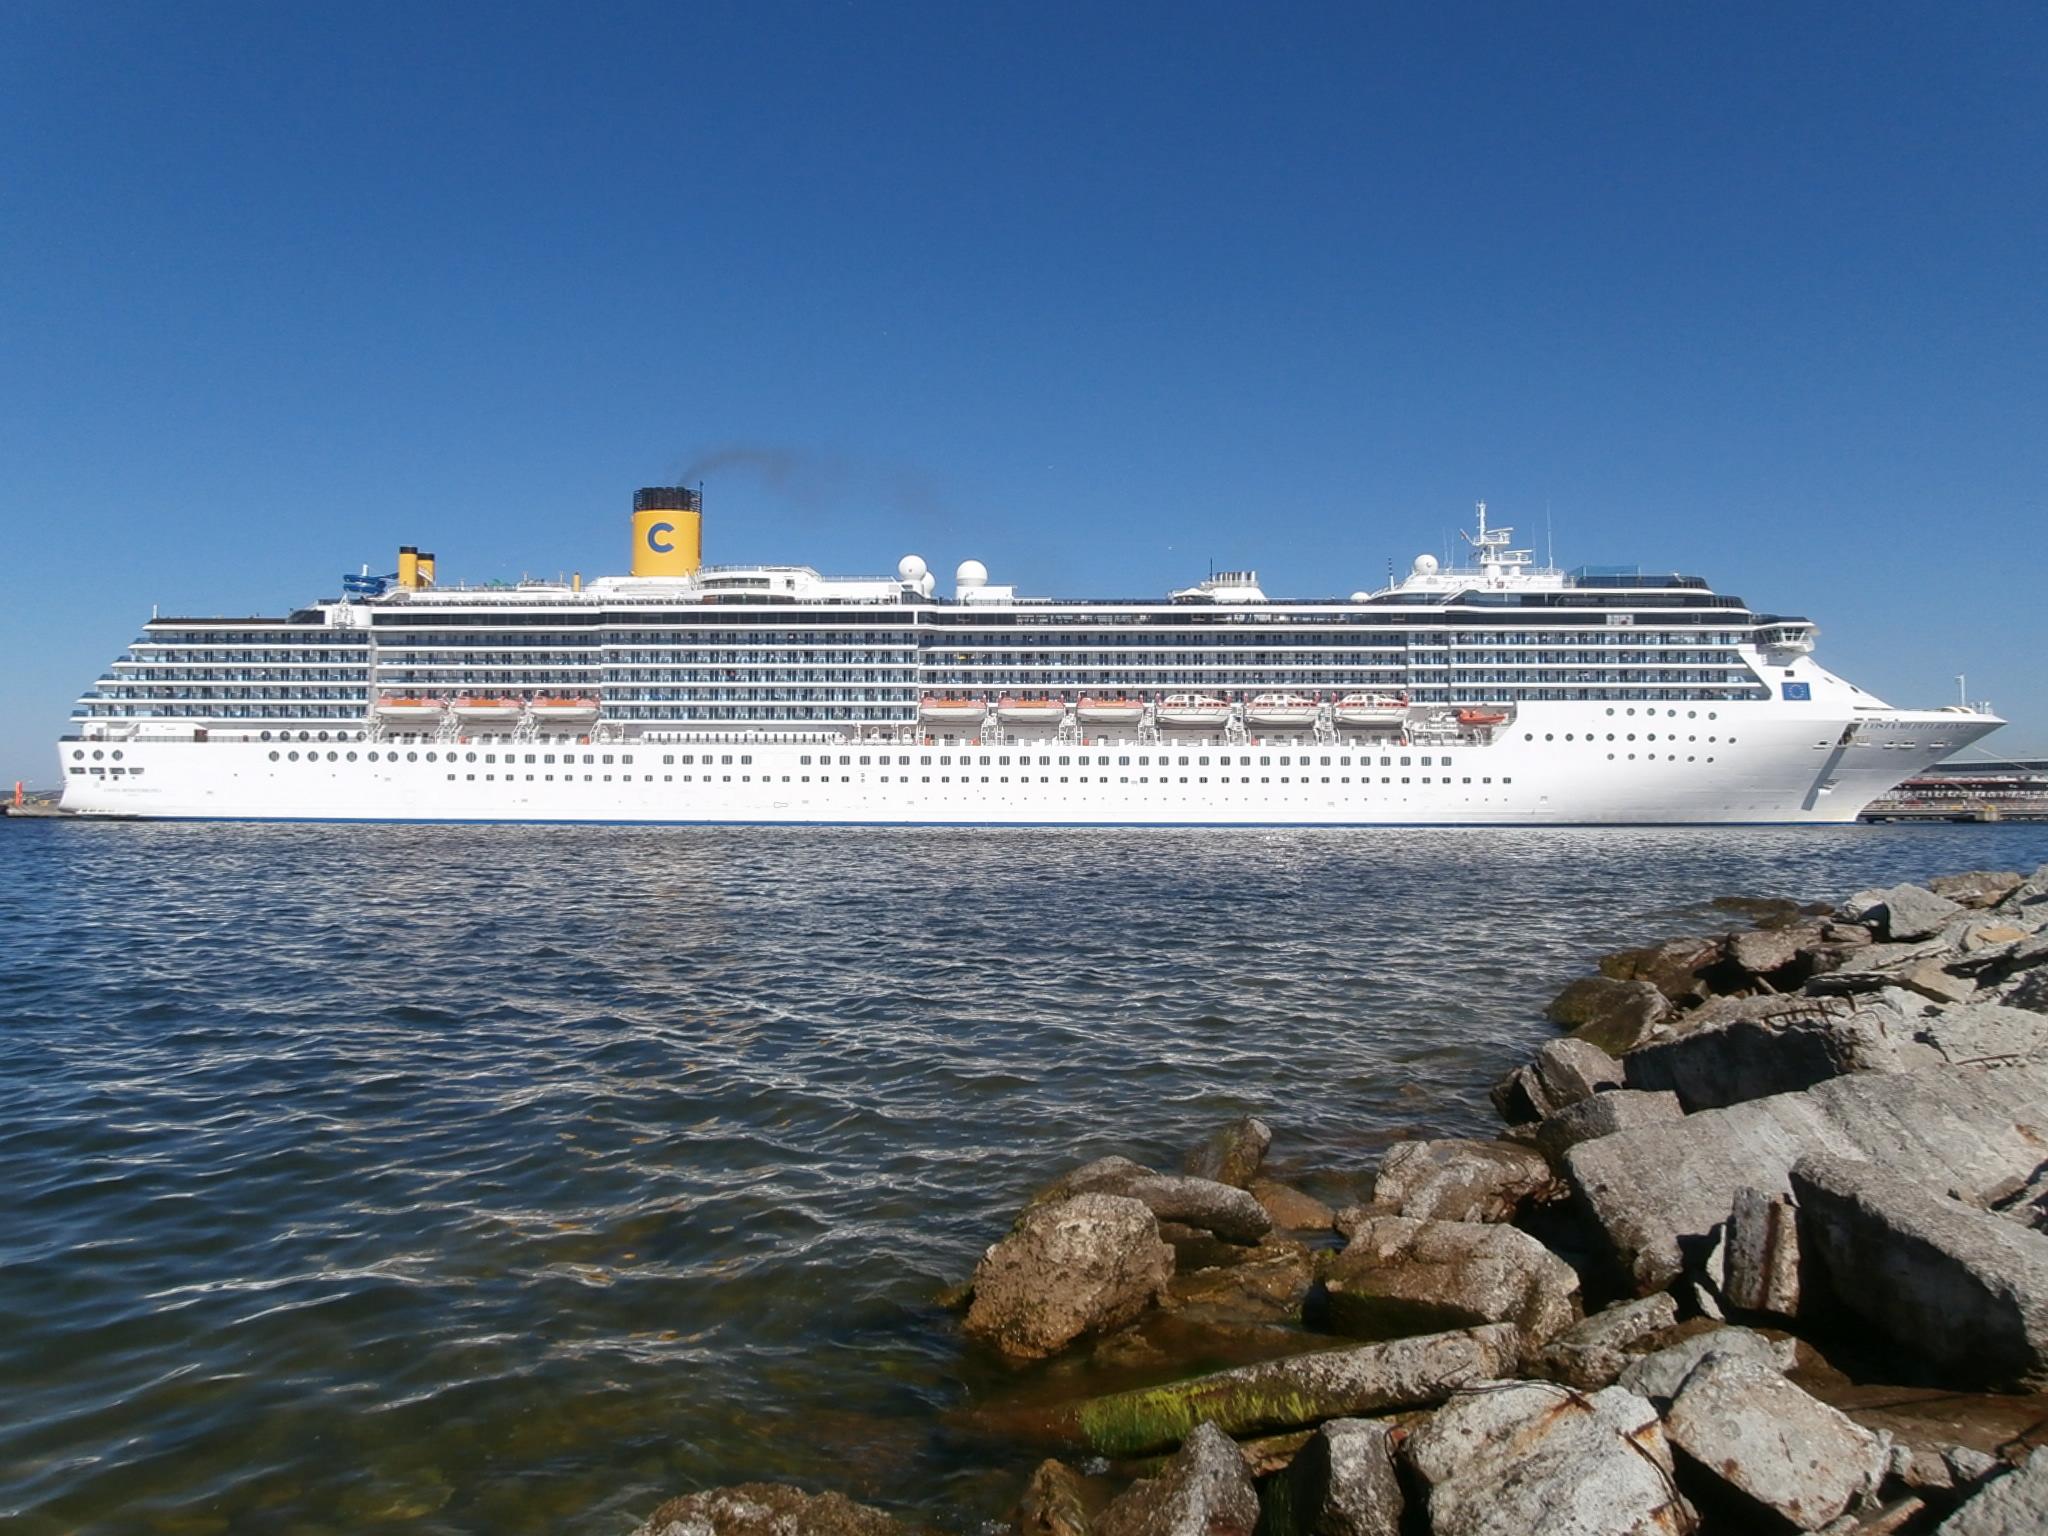 FileCosta Mediterranea Starboard Side Port Of Tallinn June - Port or starboard side of cruise ship